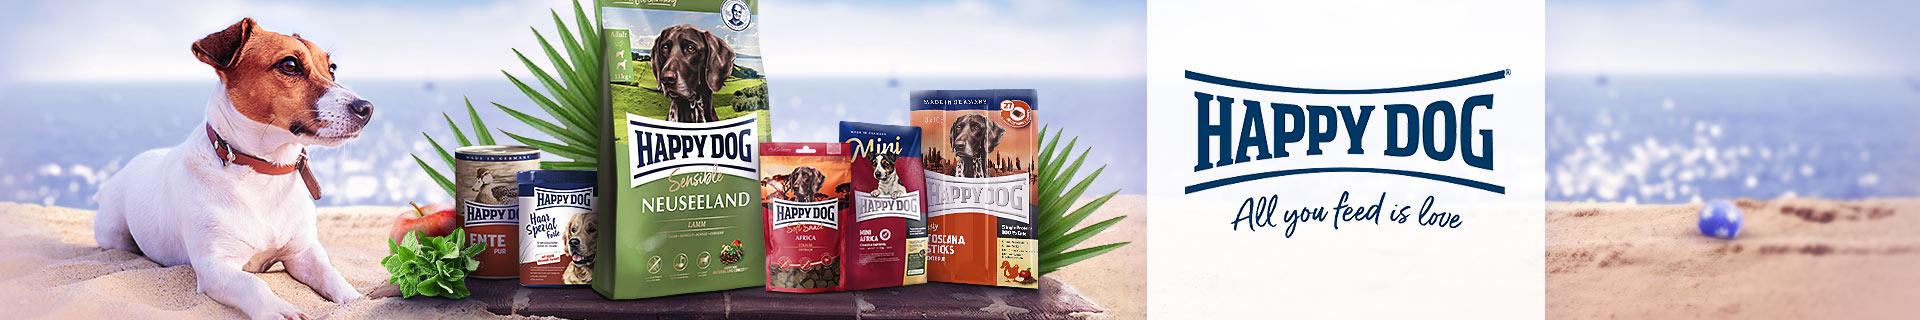 Happy Dog Markenshop